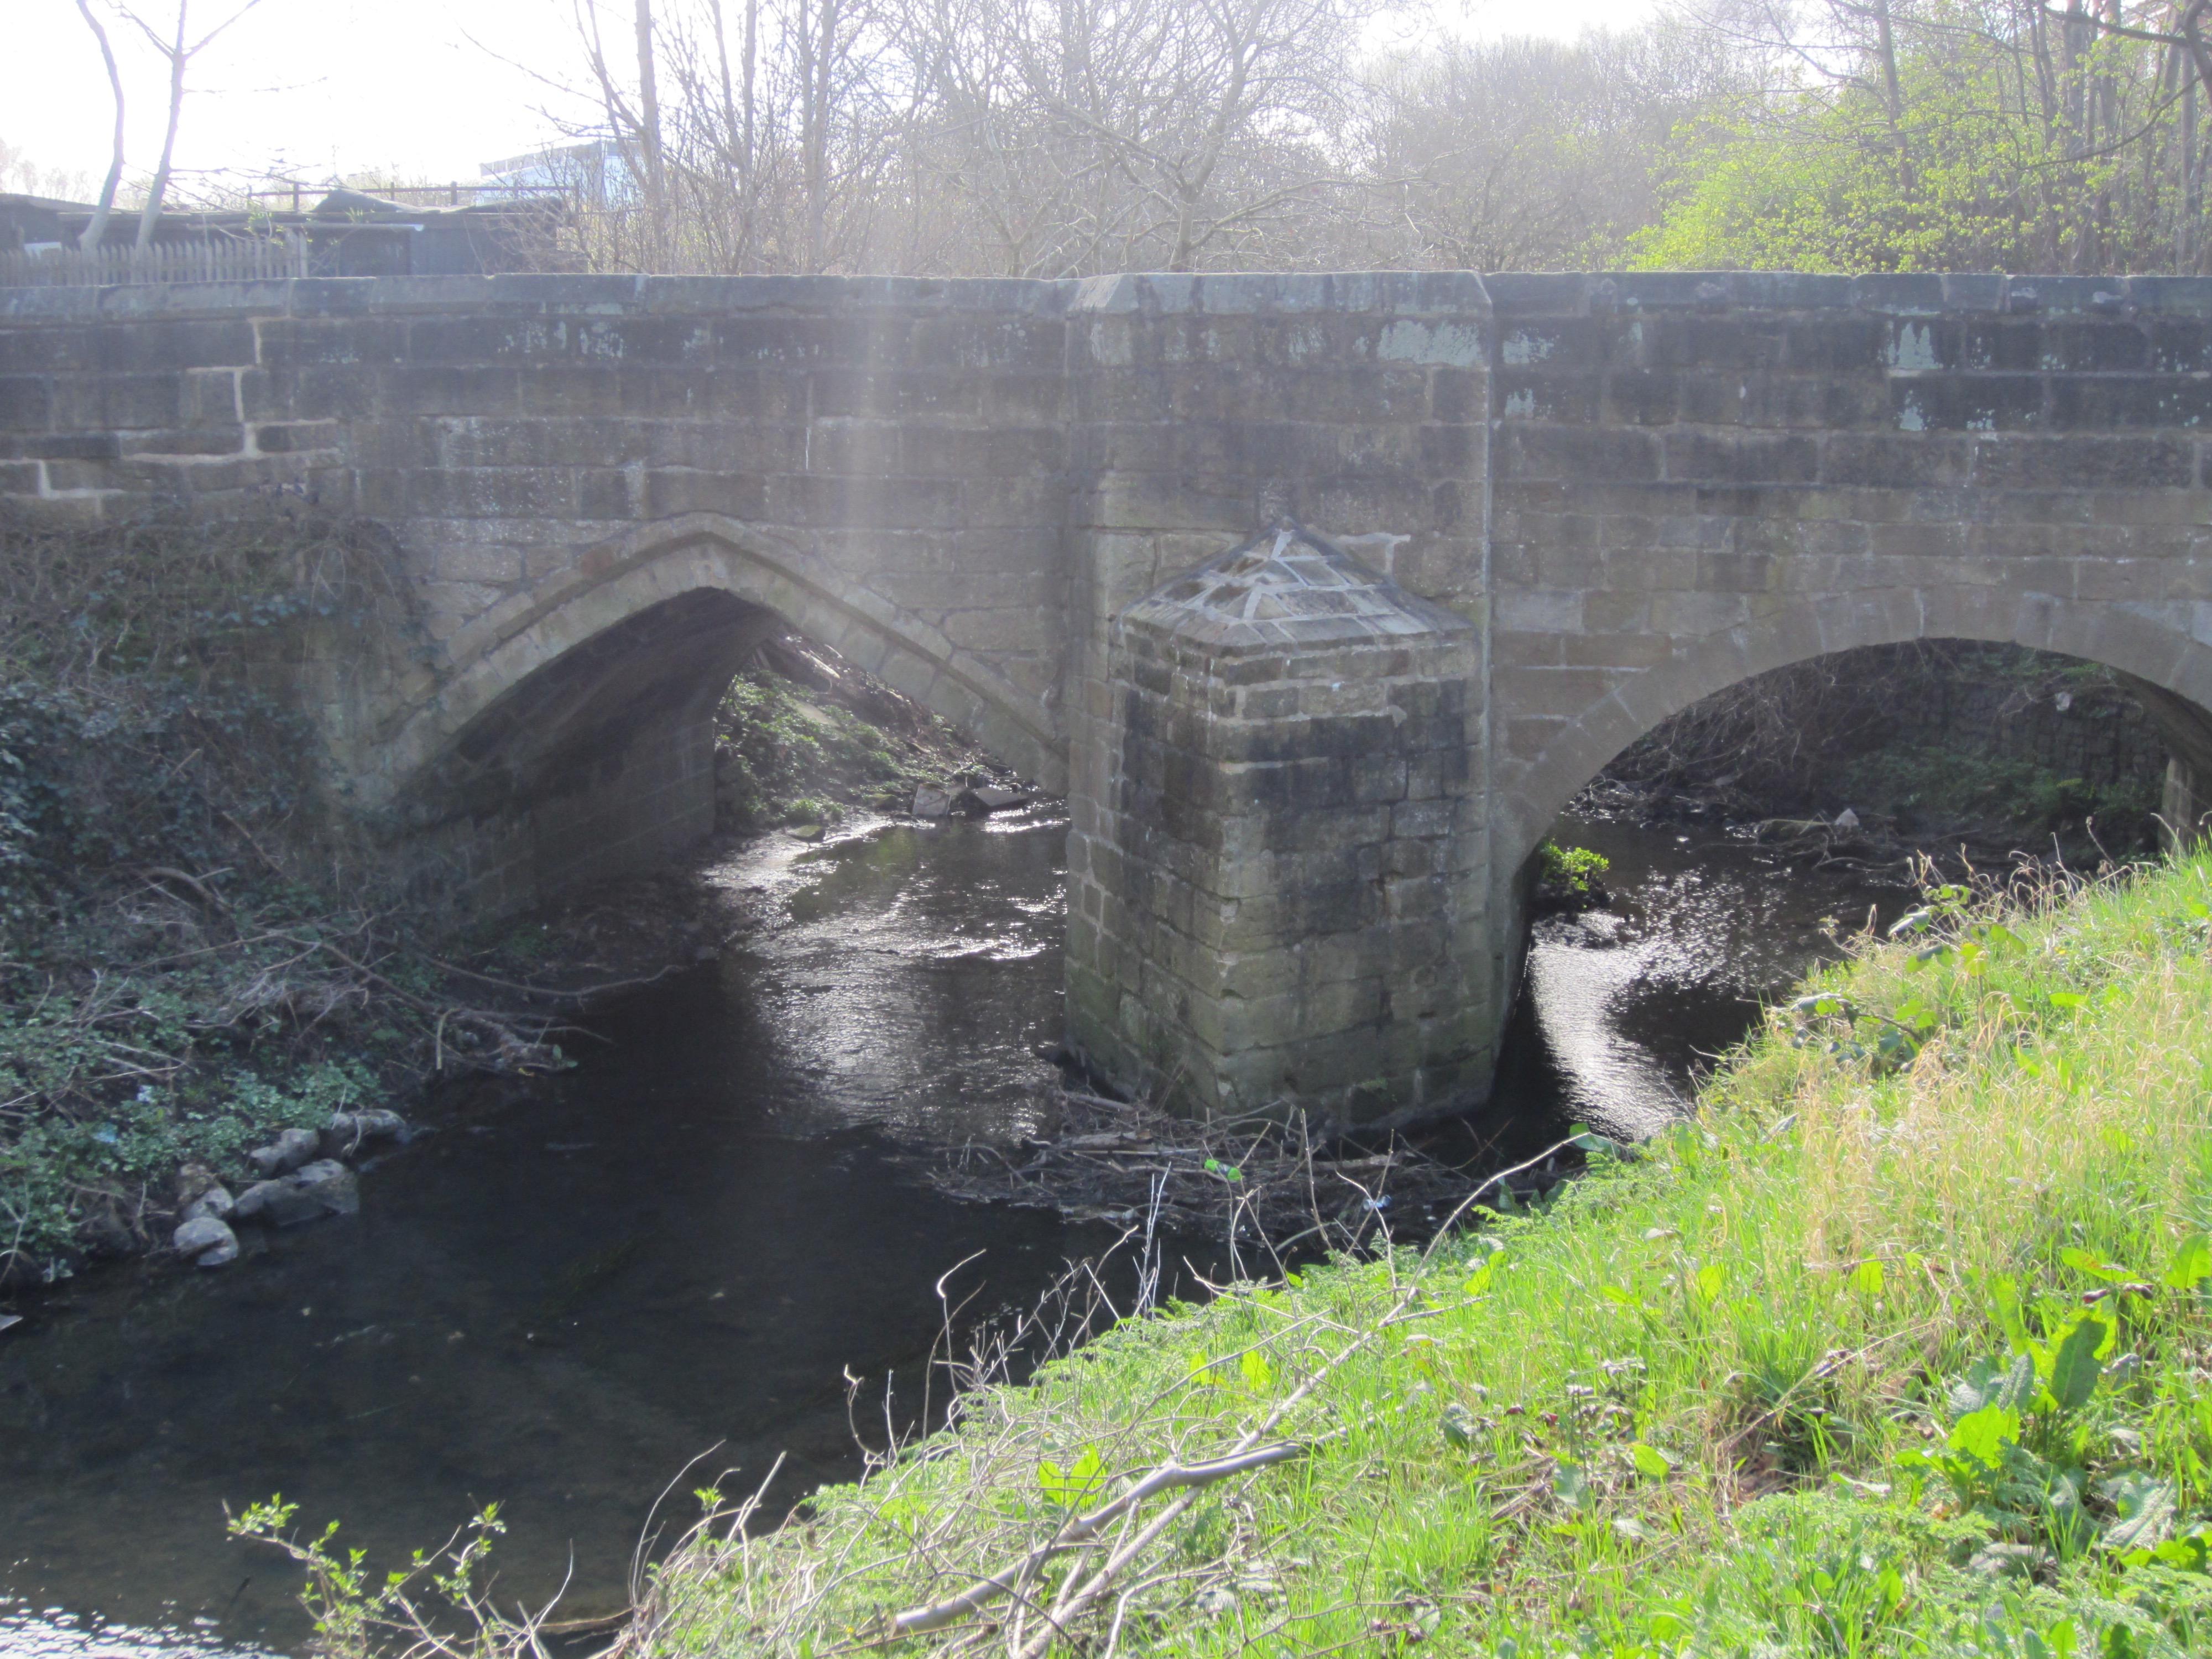 Salter's Bridge